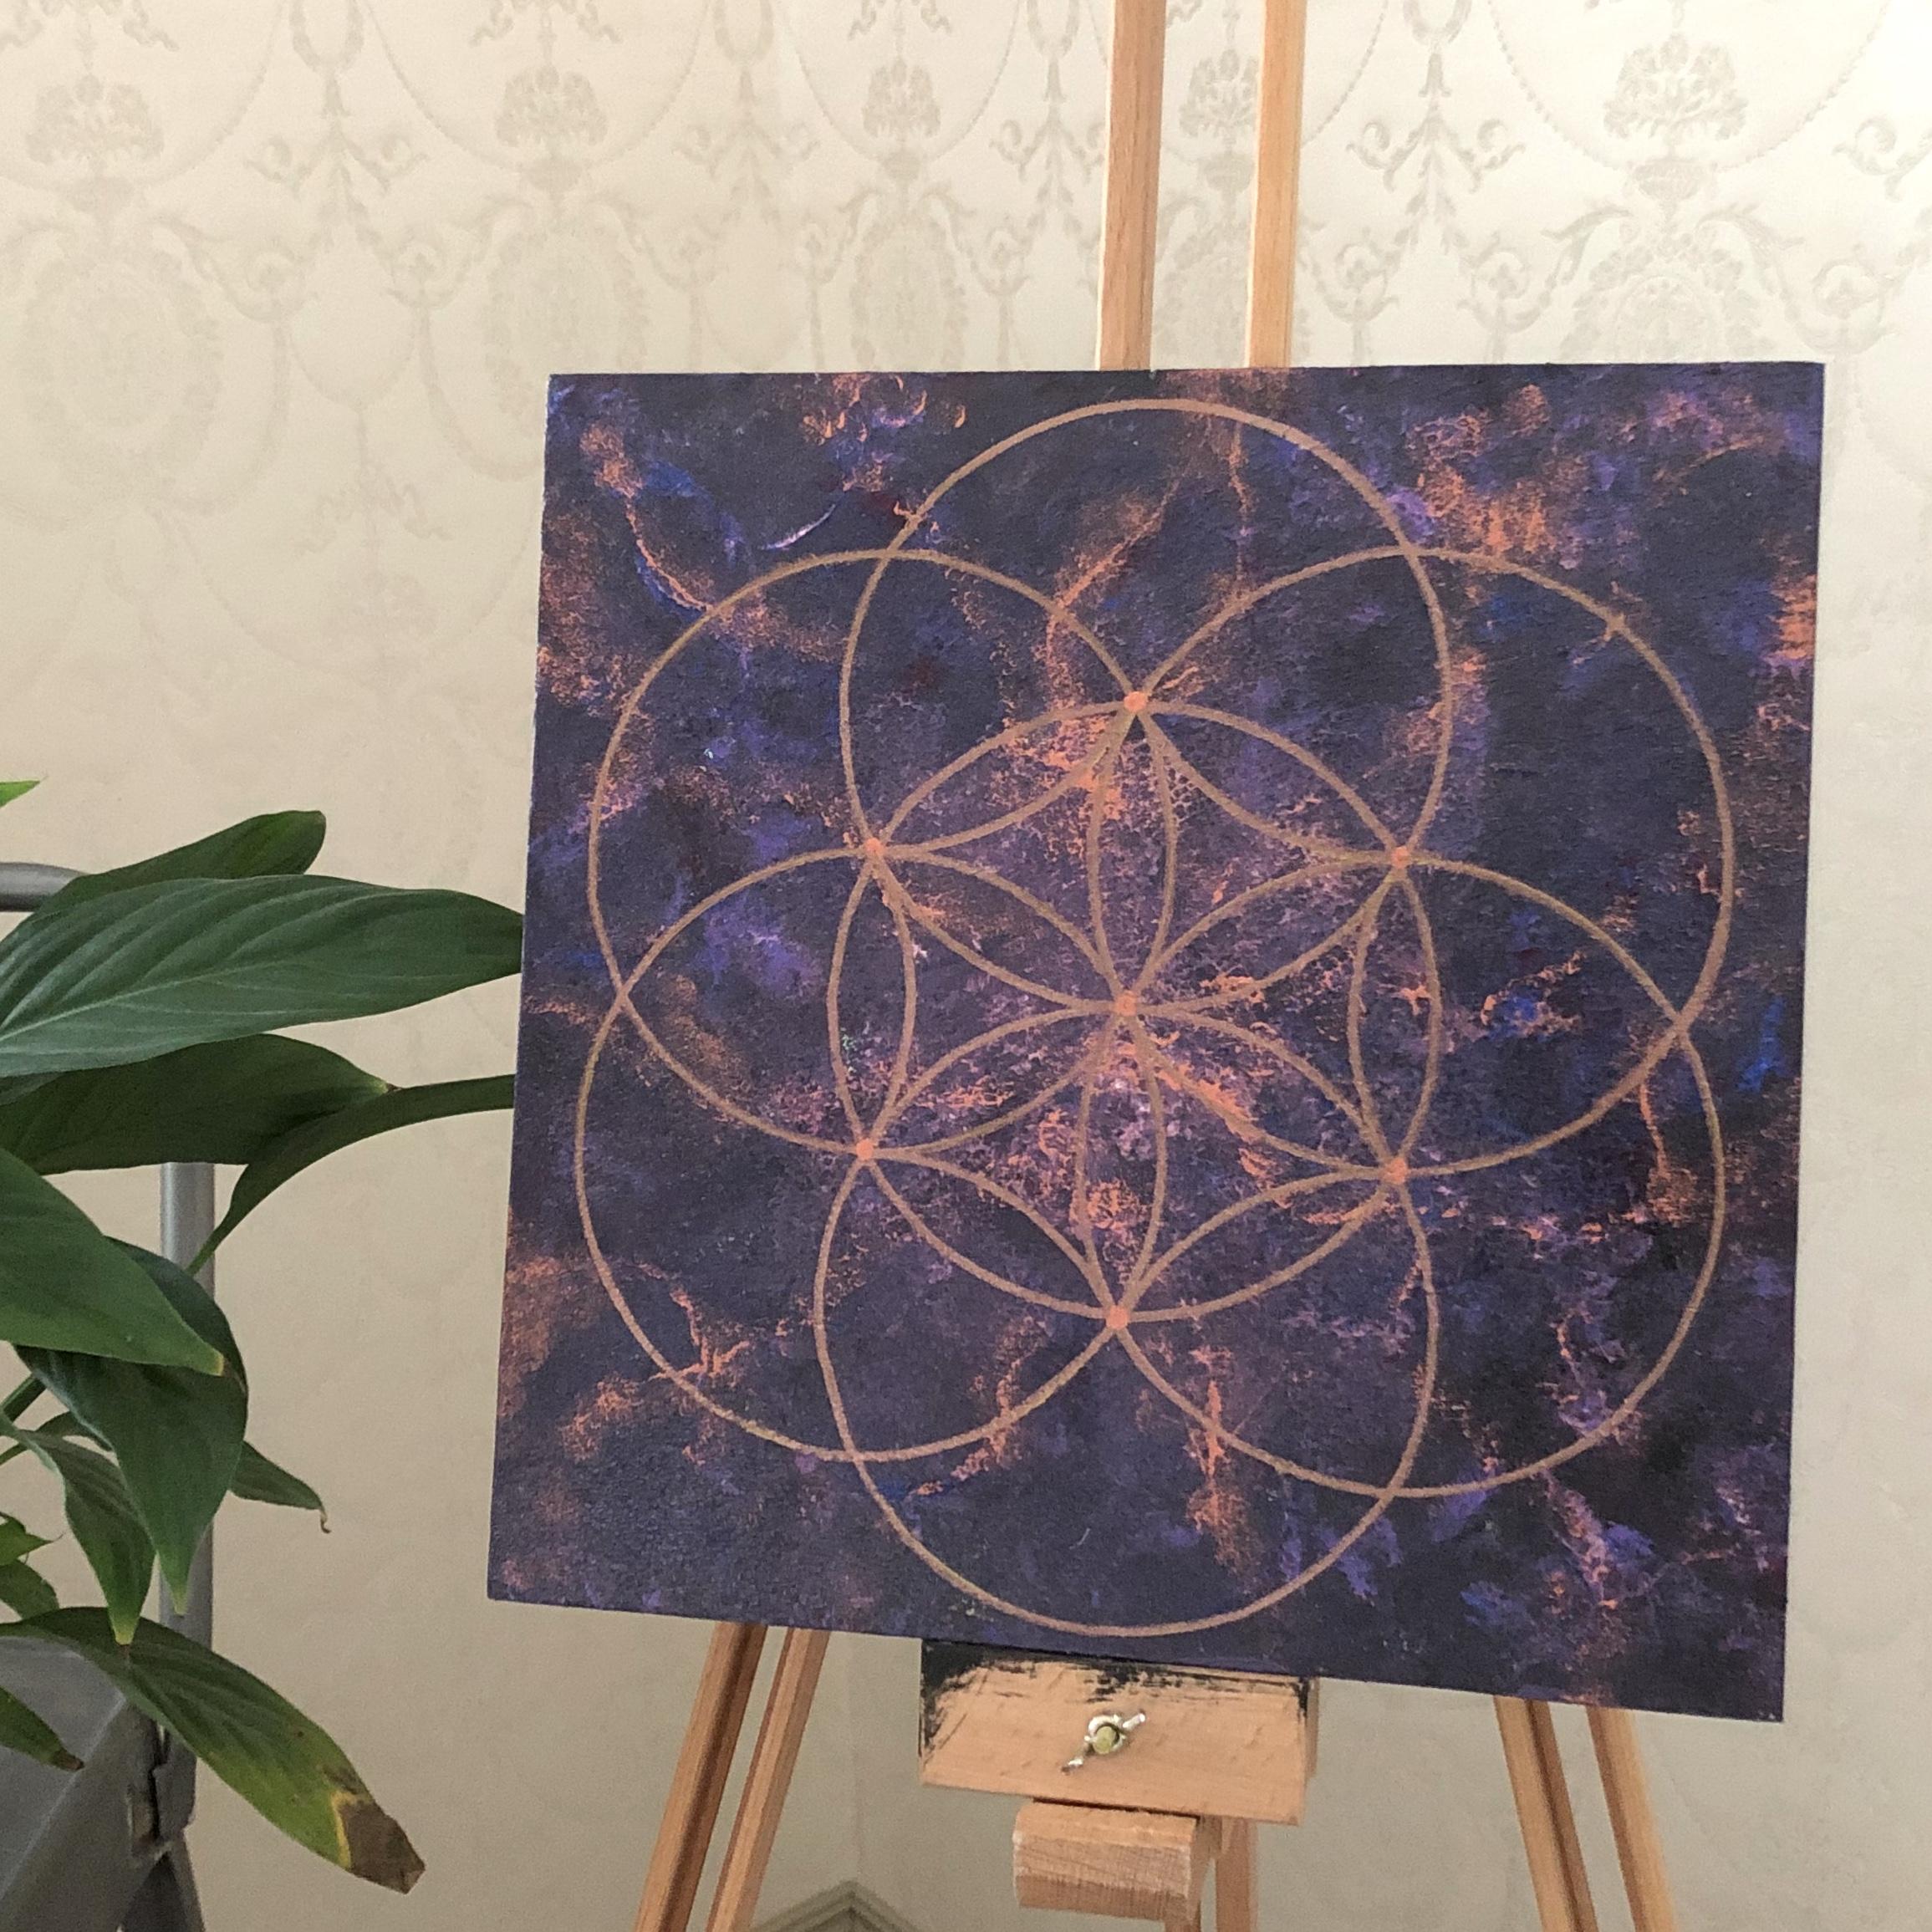 Pyhät geometriset taulut: Sielun peilisi, 30 x 30 cm